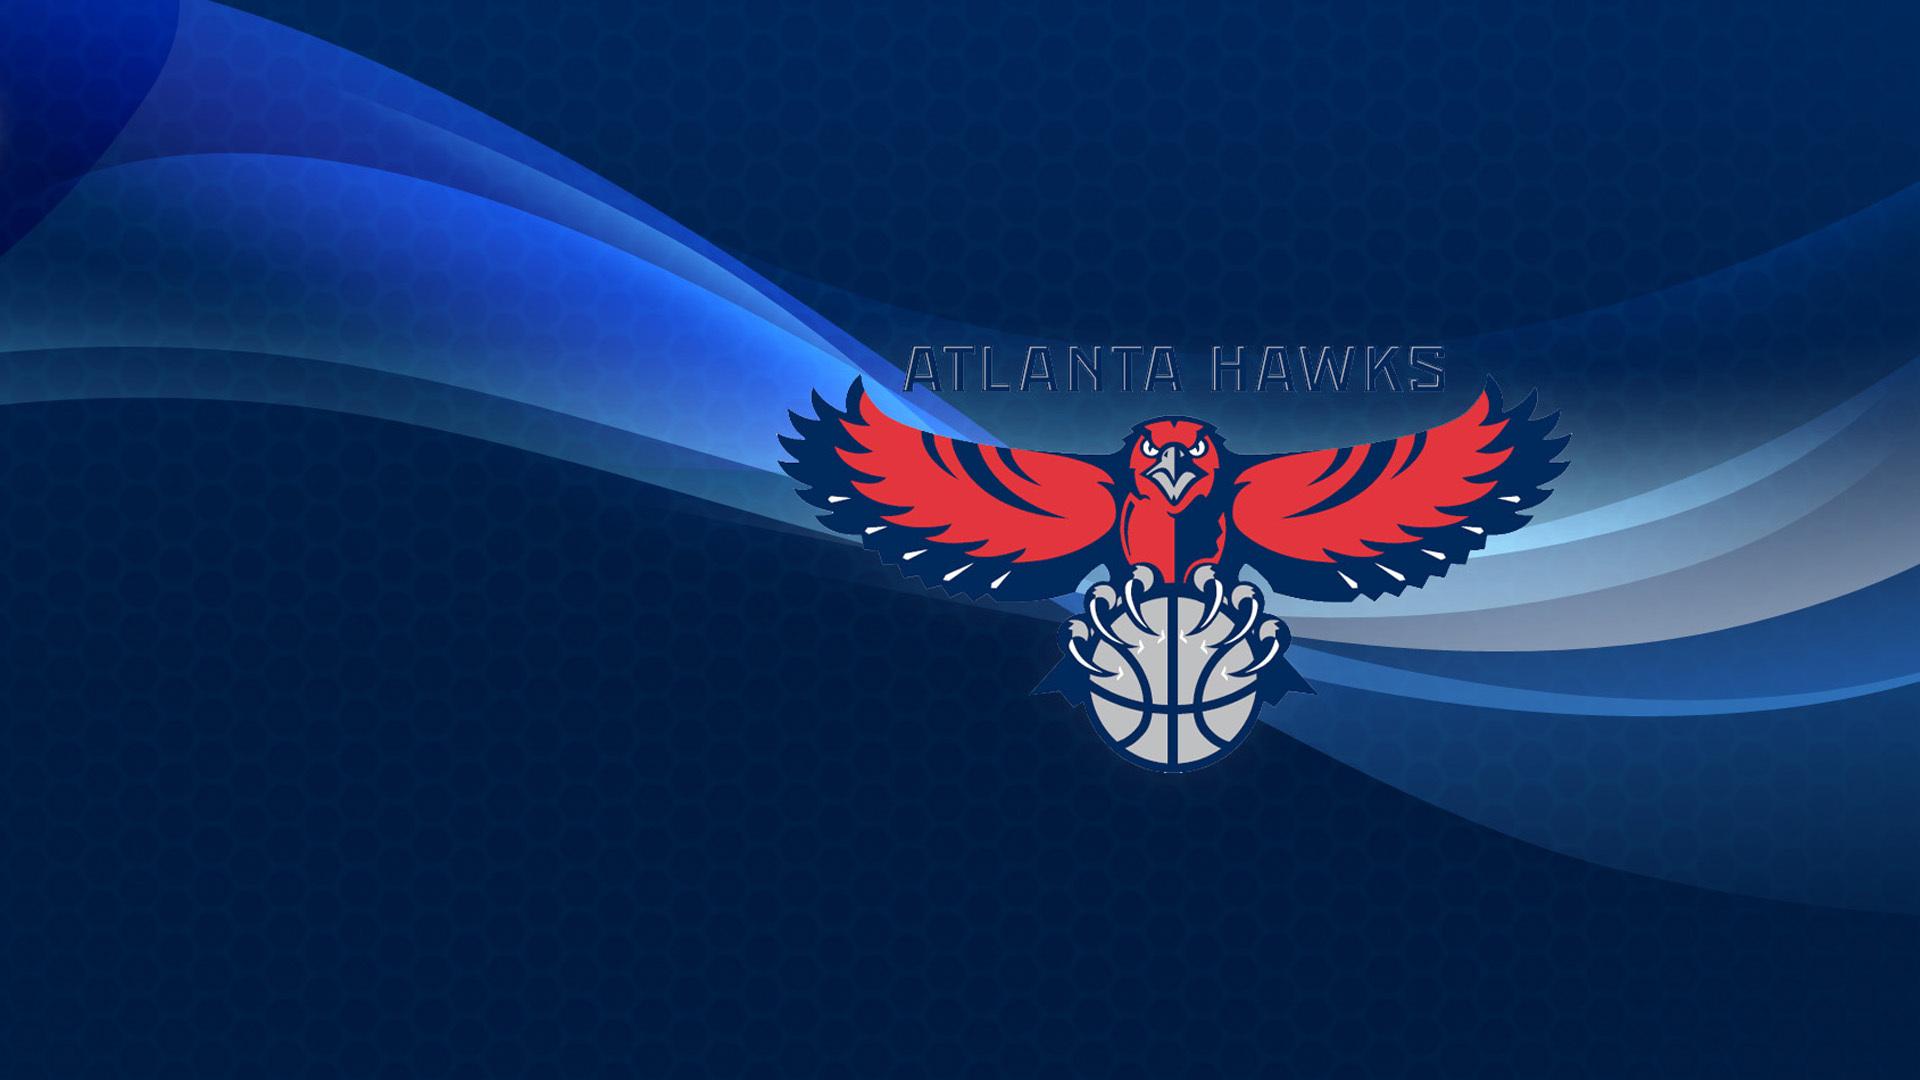 Atlanta Hawks For Desktop